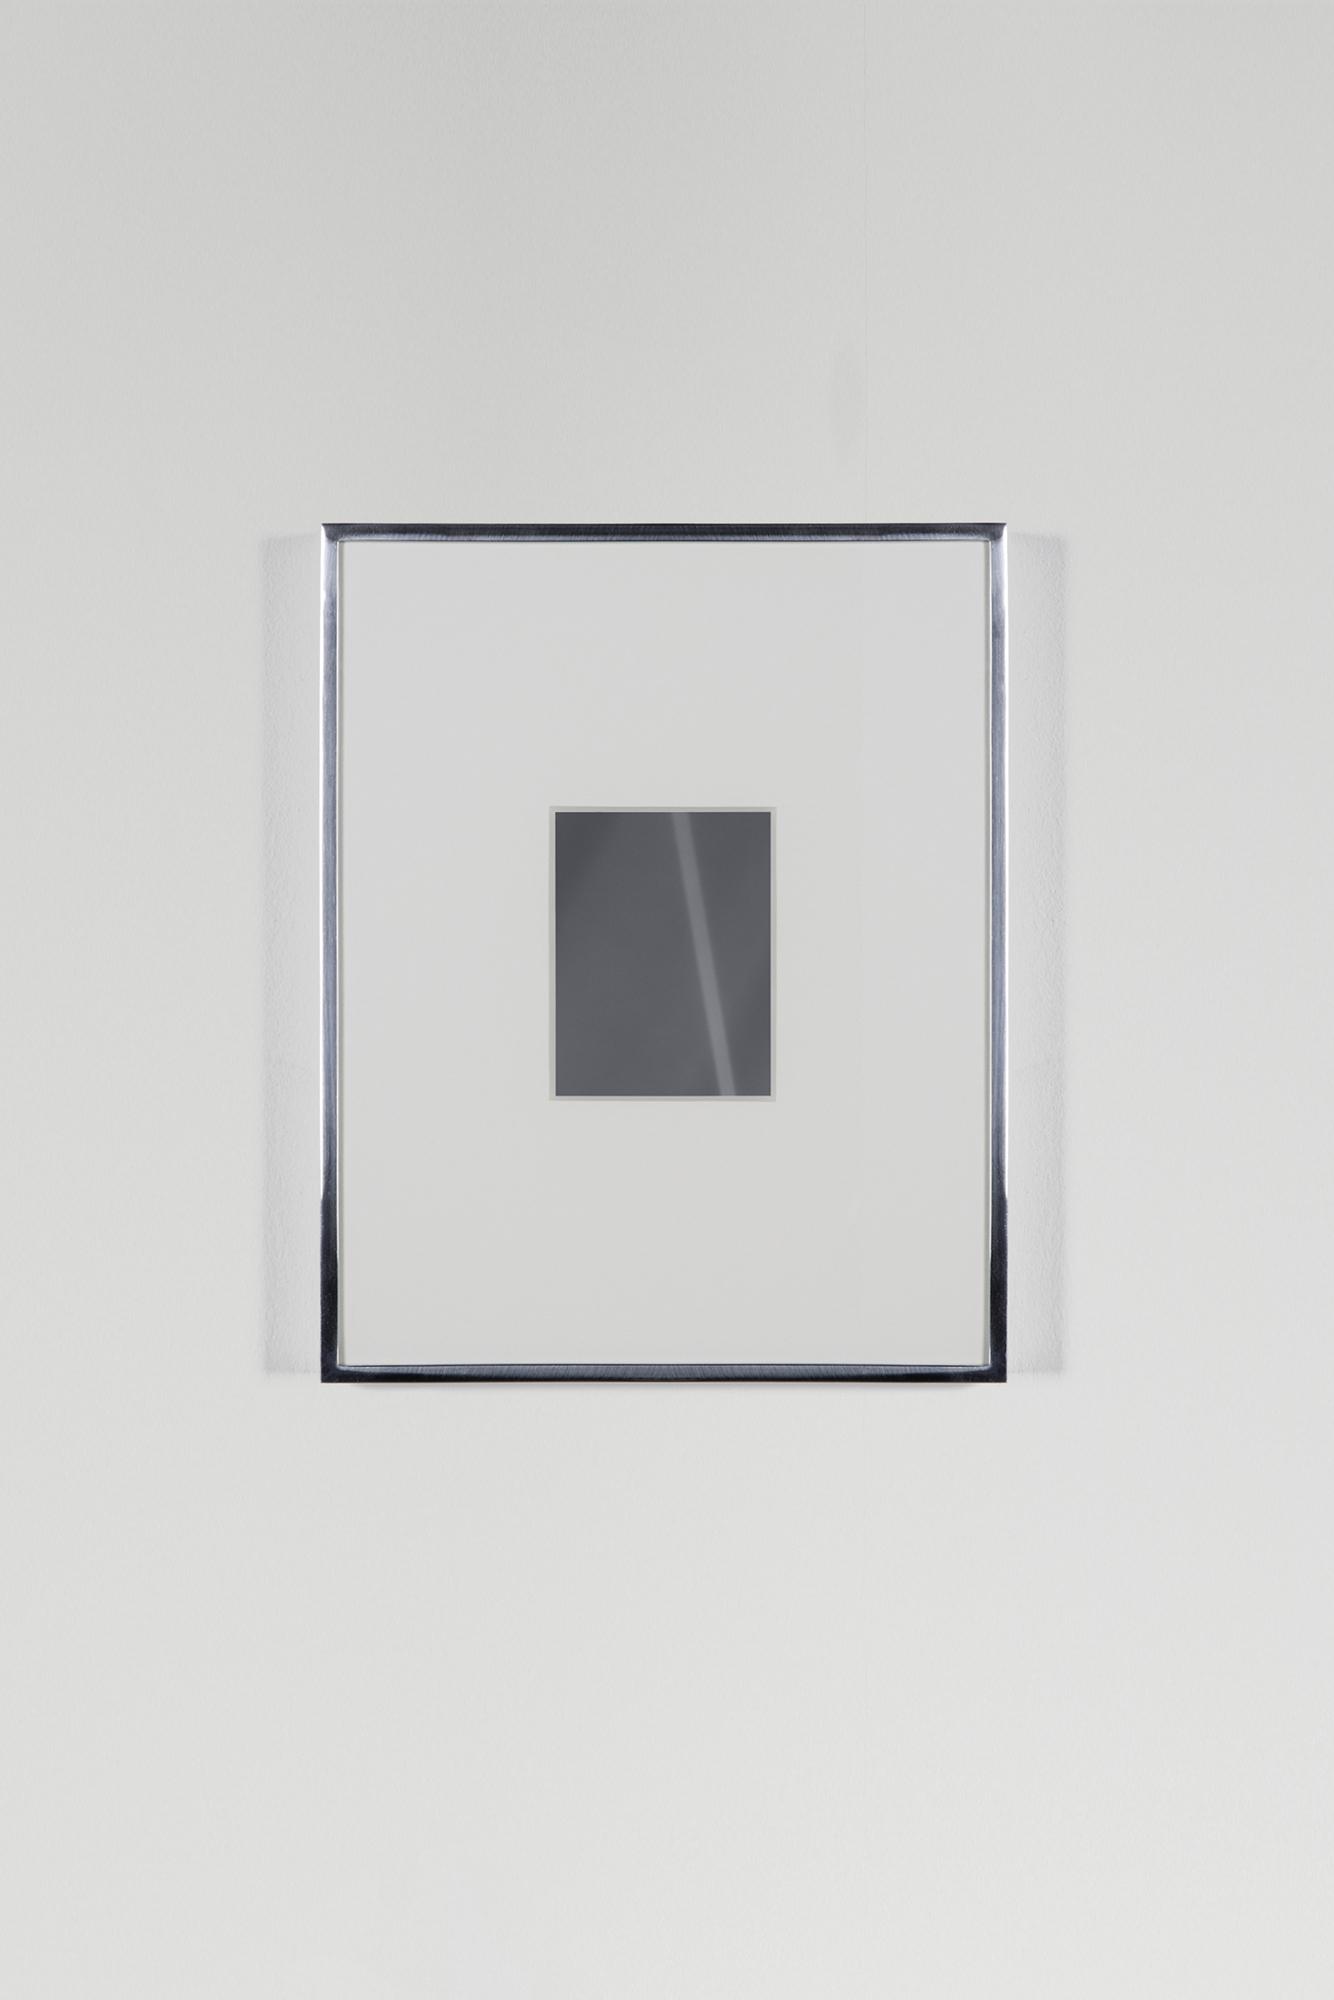 Transparency (Negative) [Kodak Portra 400NC Em. No. 1022: February 2–5, 2016 LAX/MEX MEX/LAX]    2017   Epson Ultrachrome K3 archival ink jet print on Museo Silver Rag Paper  14 x 11 inches   Transparencies, 2014–